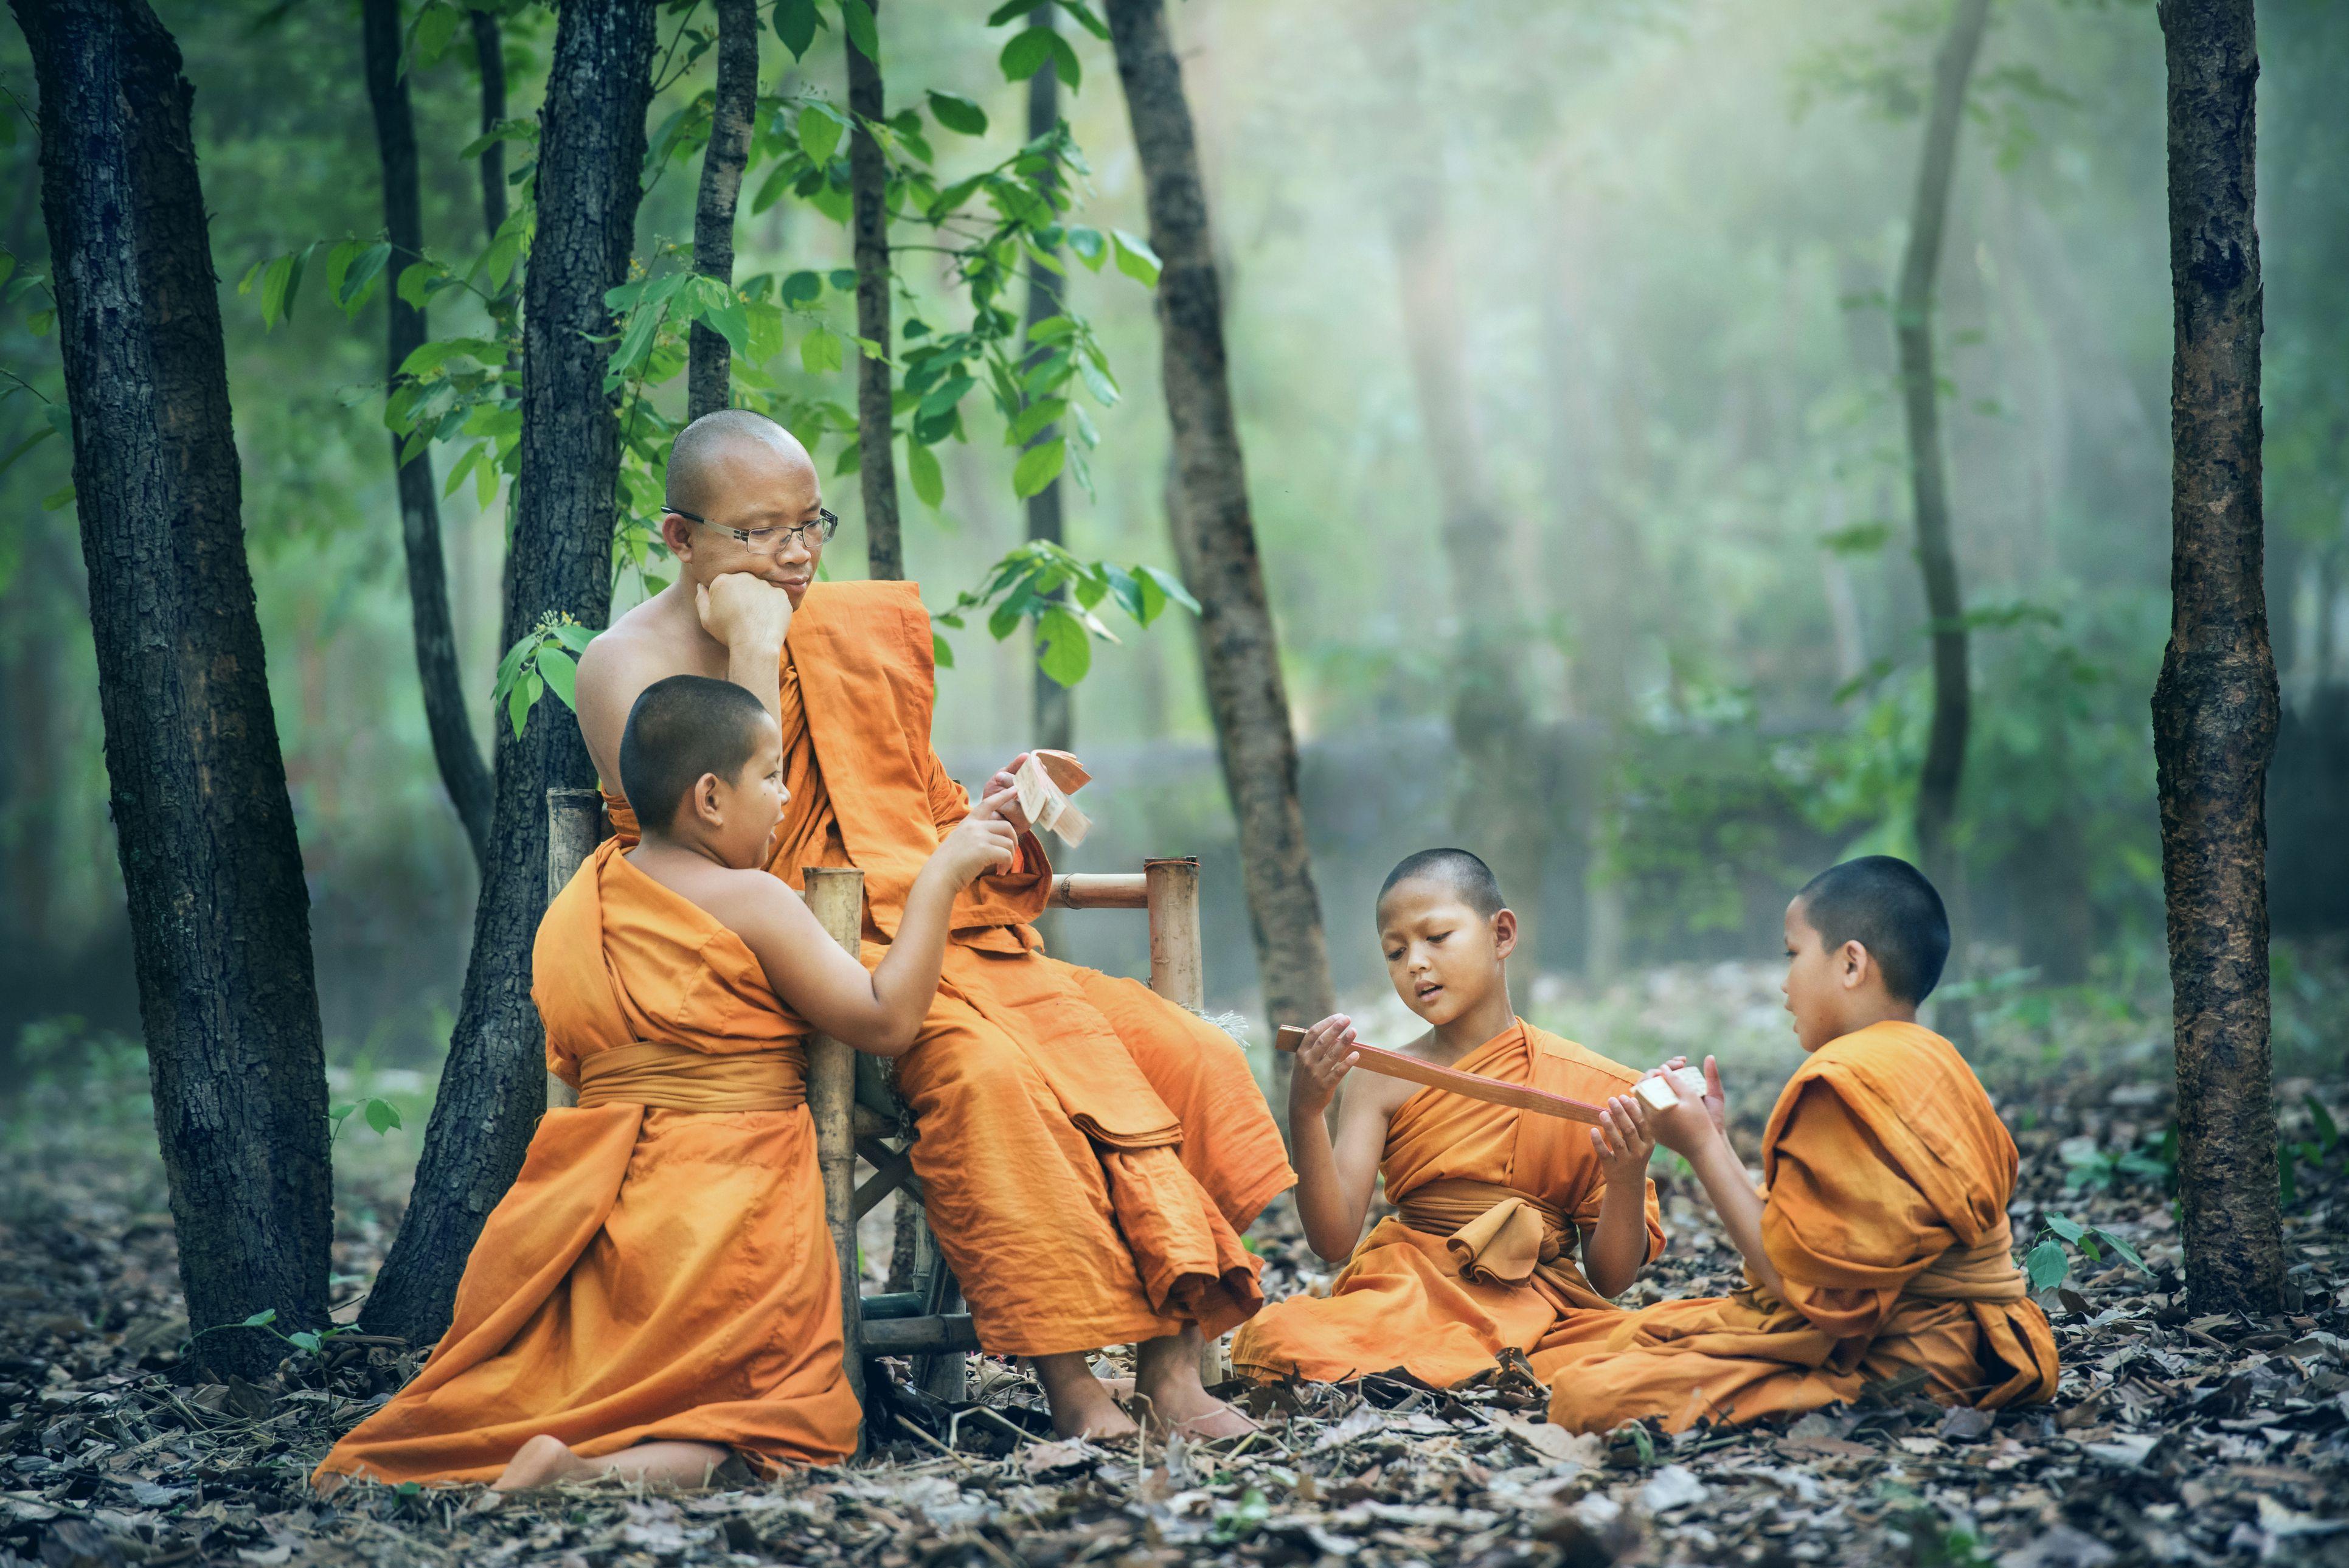 Mudita: The Buddhist Practice of Sympathetic Joy